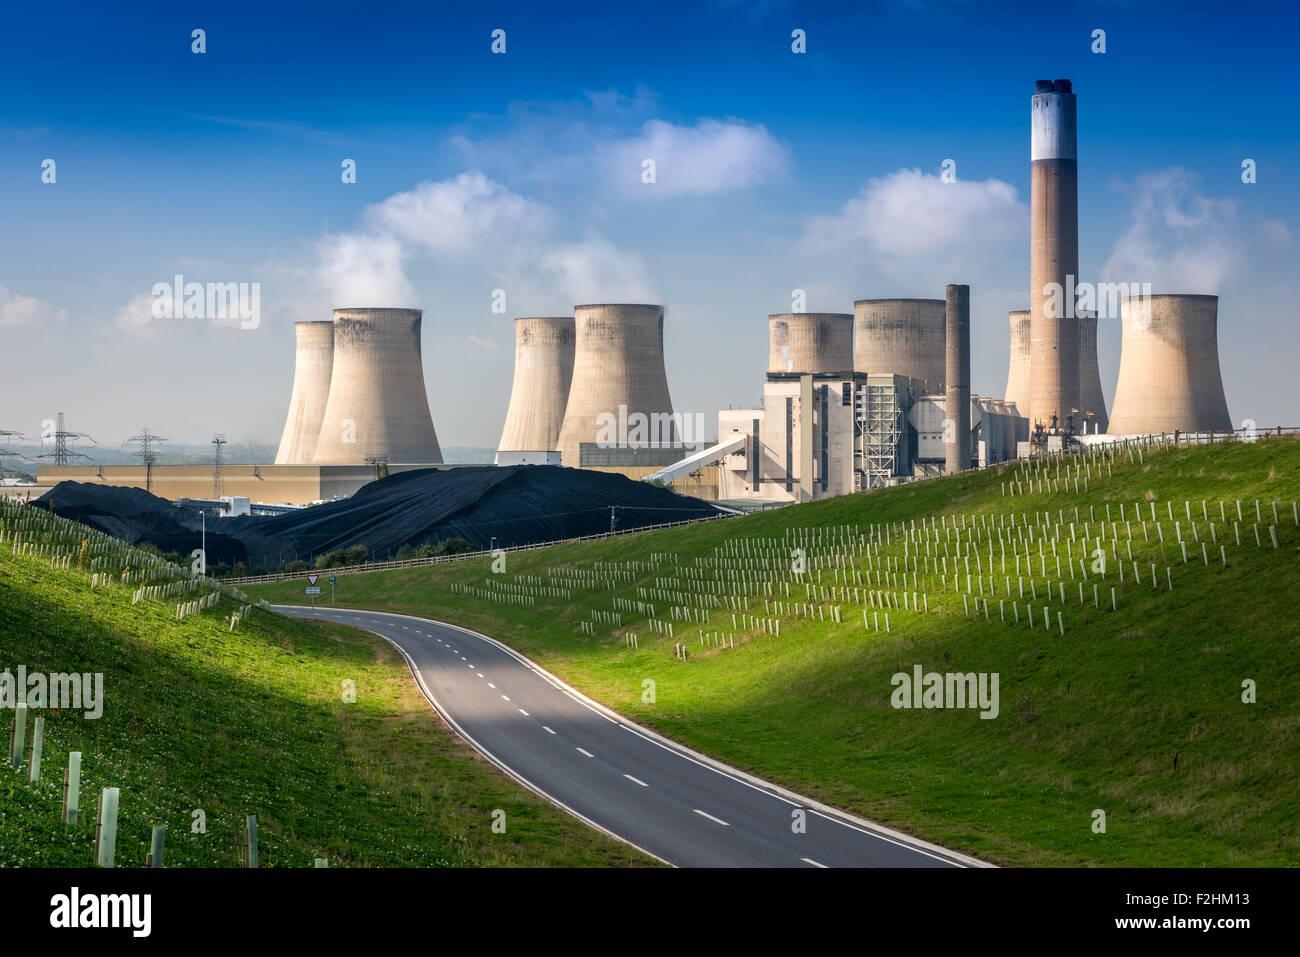 Ratcliffe-on-Soar Power Station - Stock Image